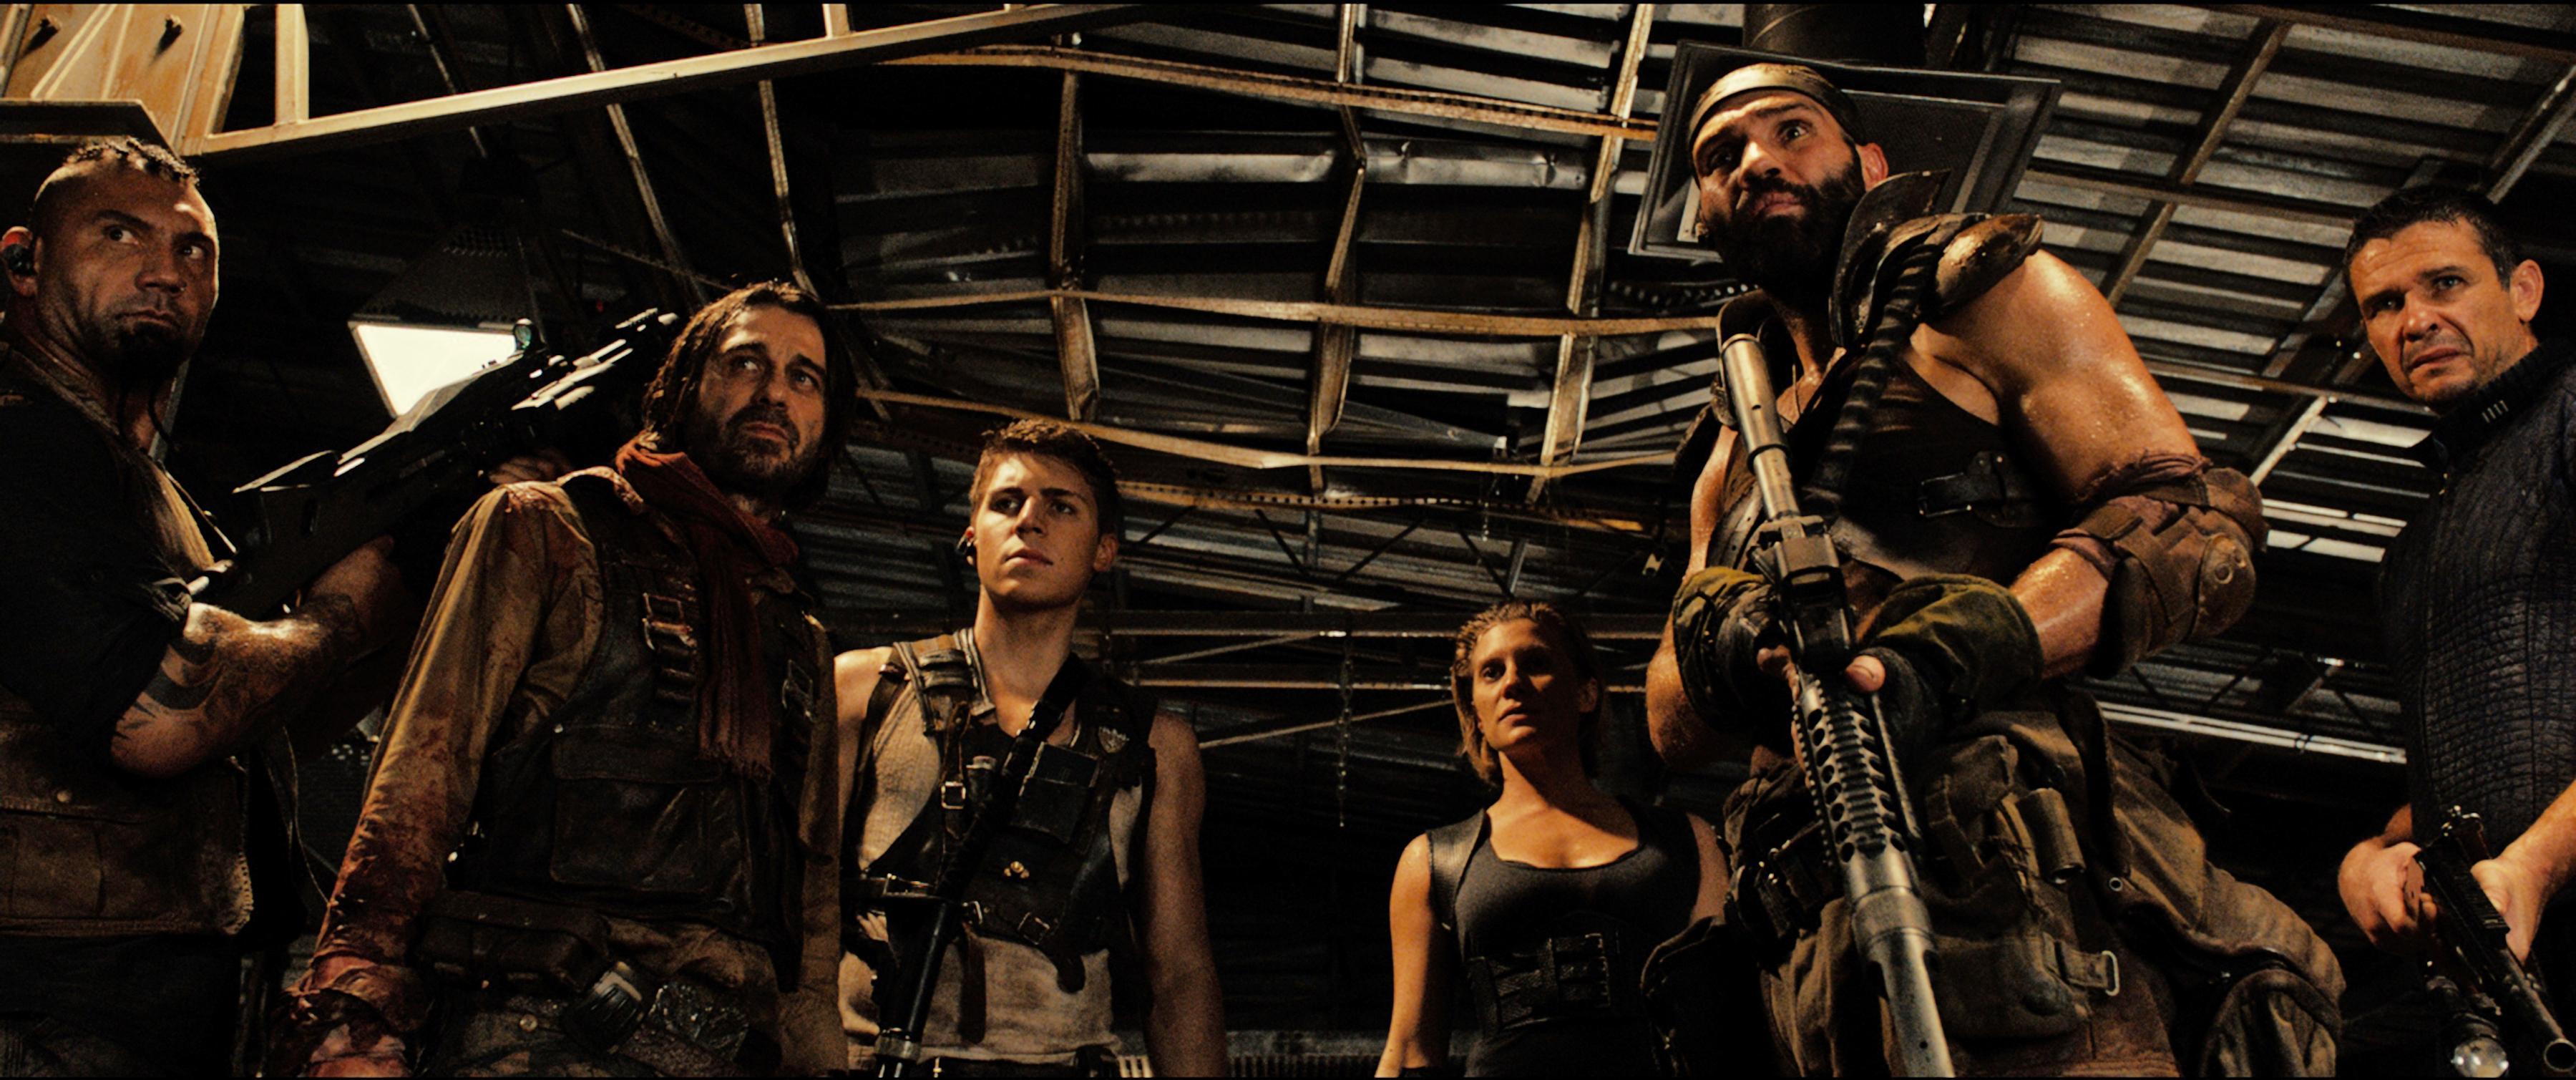 Riddick 4 Movie Review: Riddick